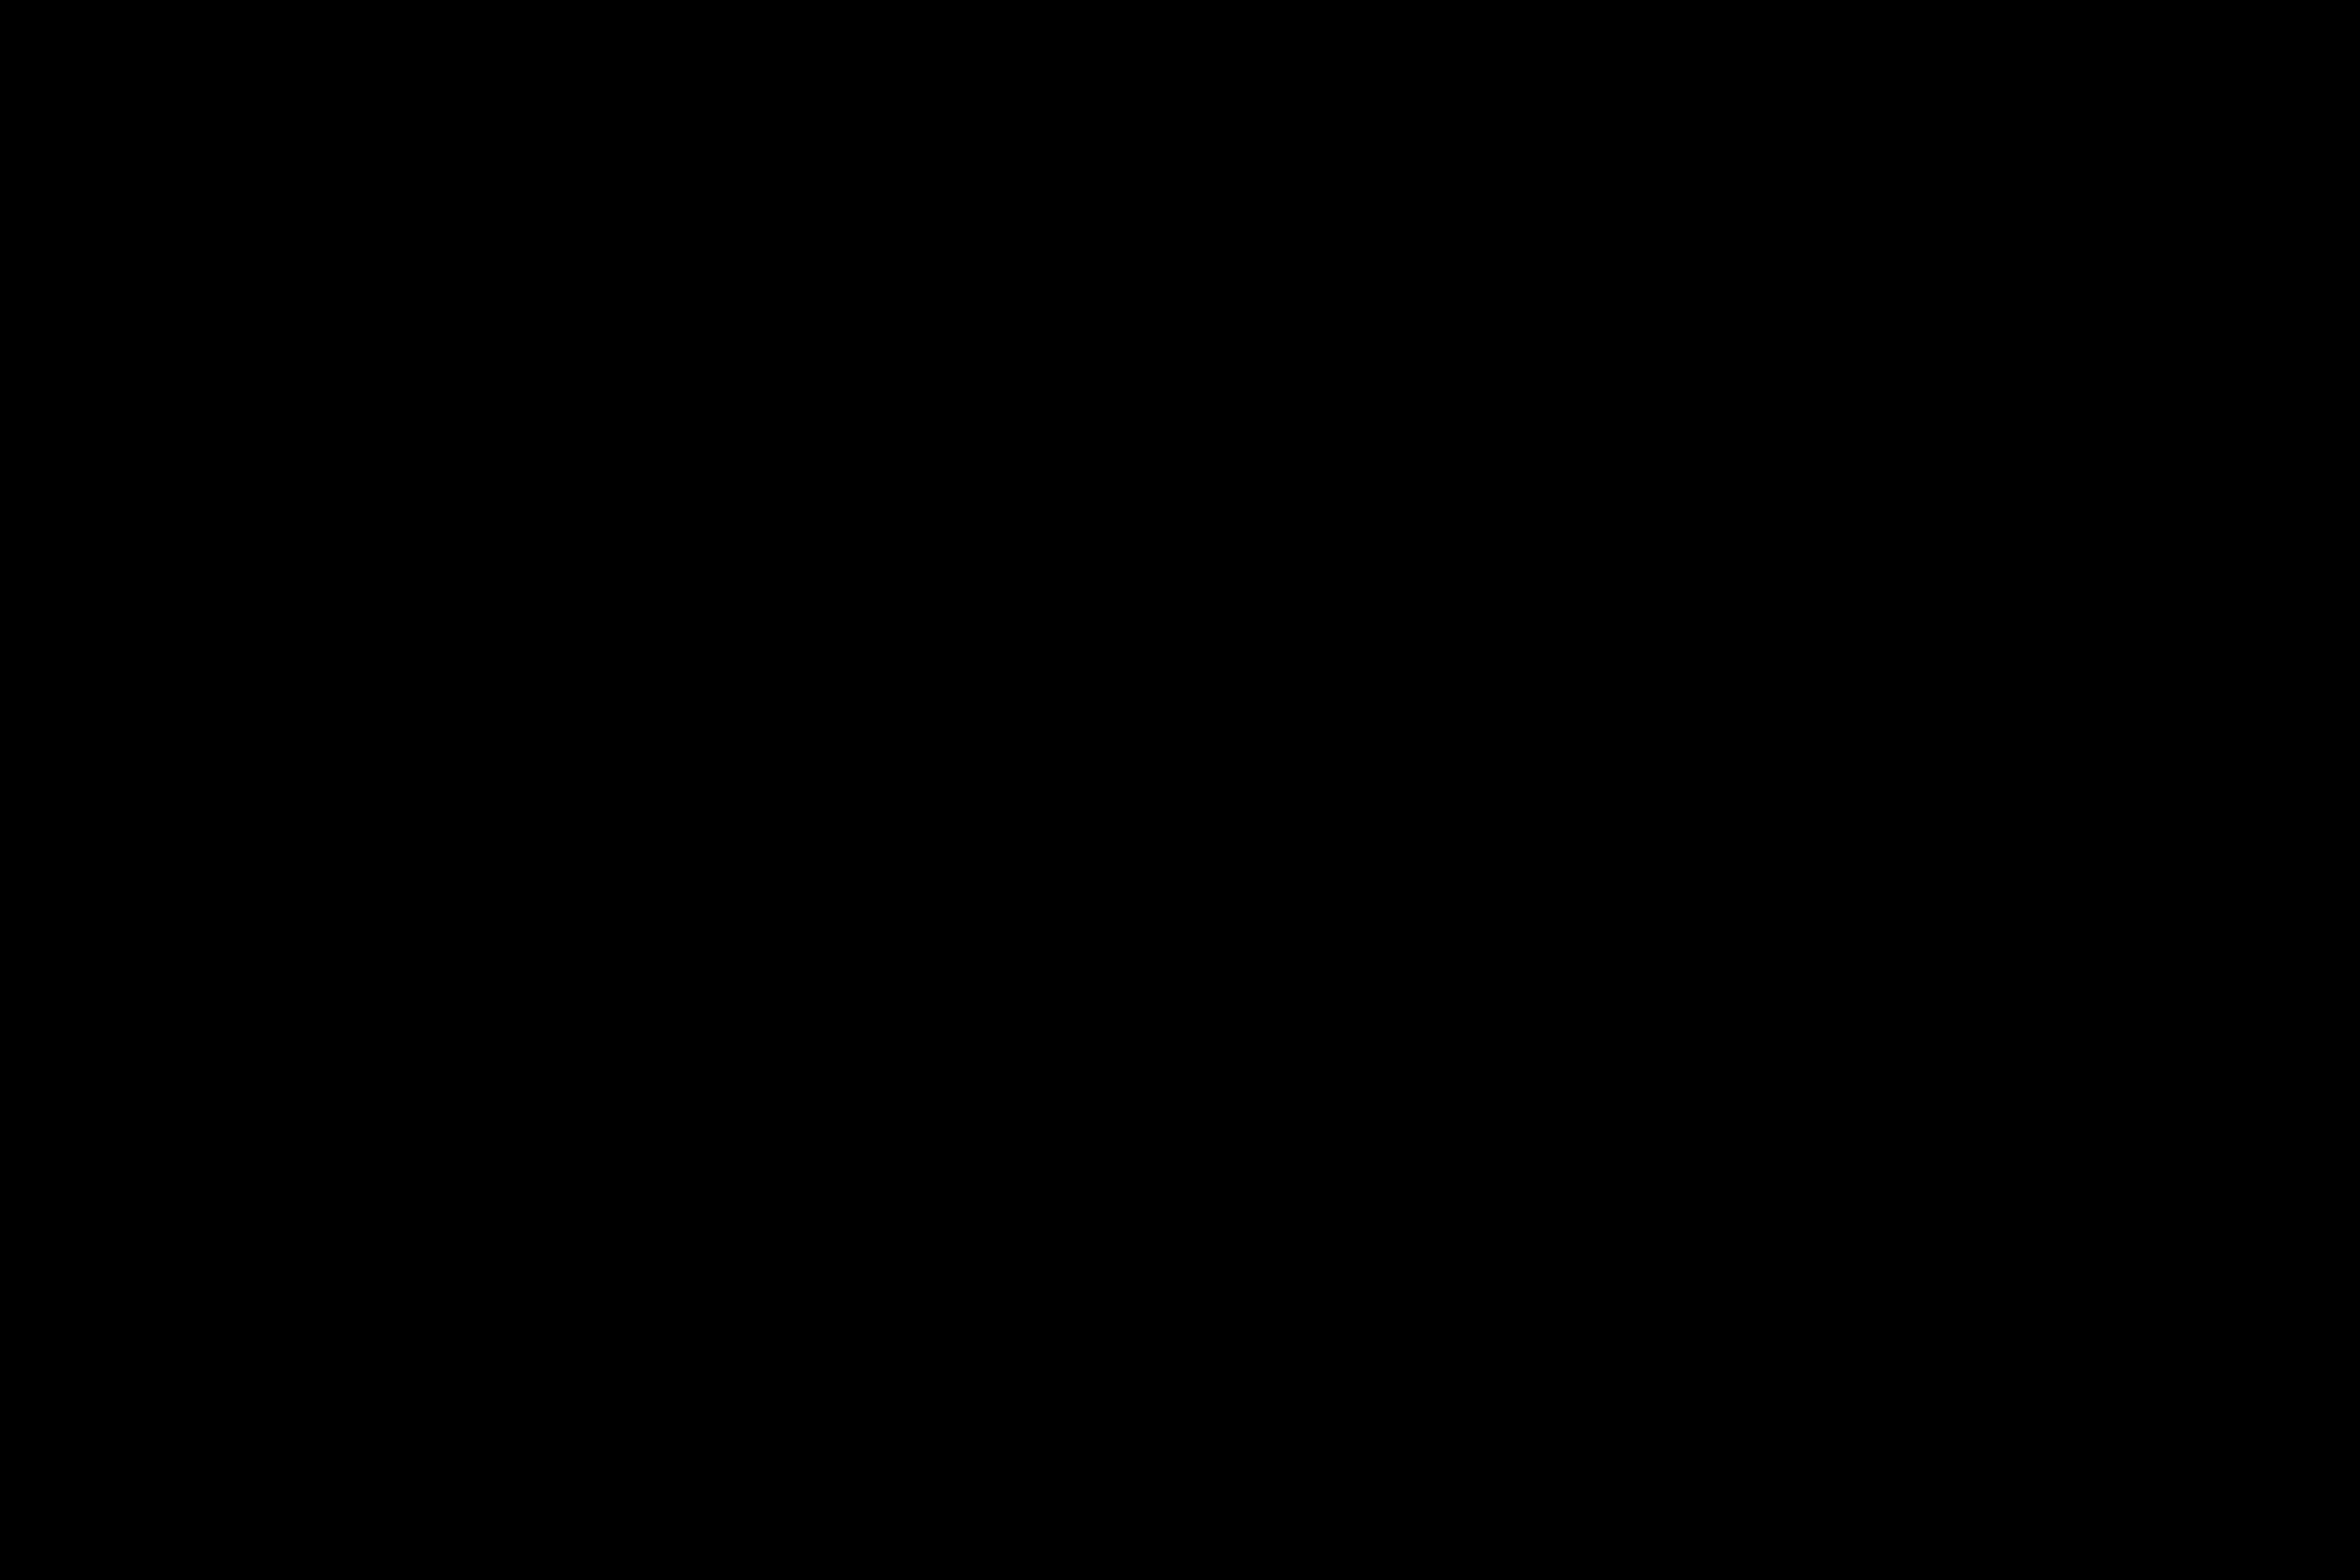 1133-006lindamswope